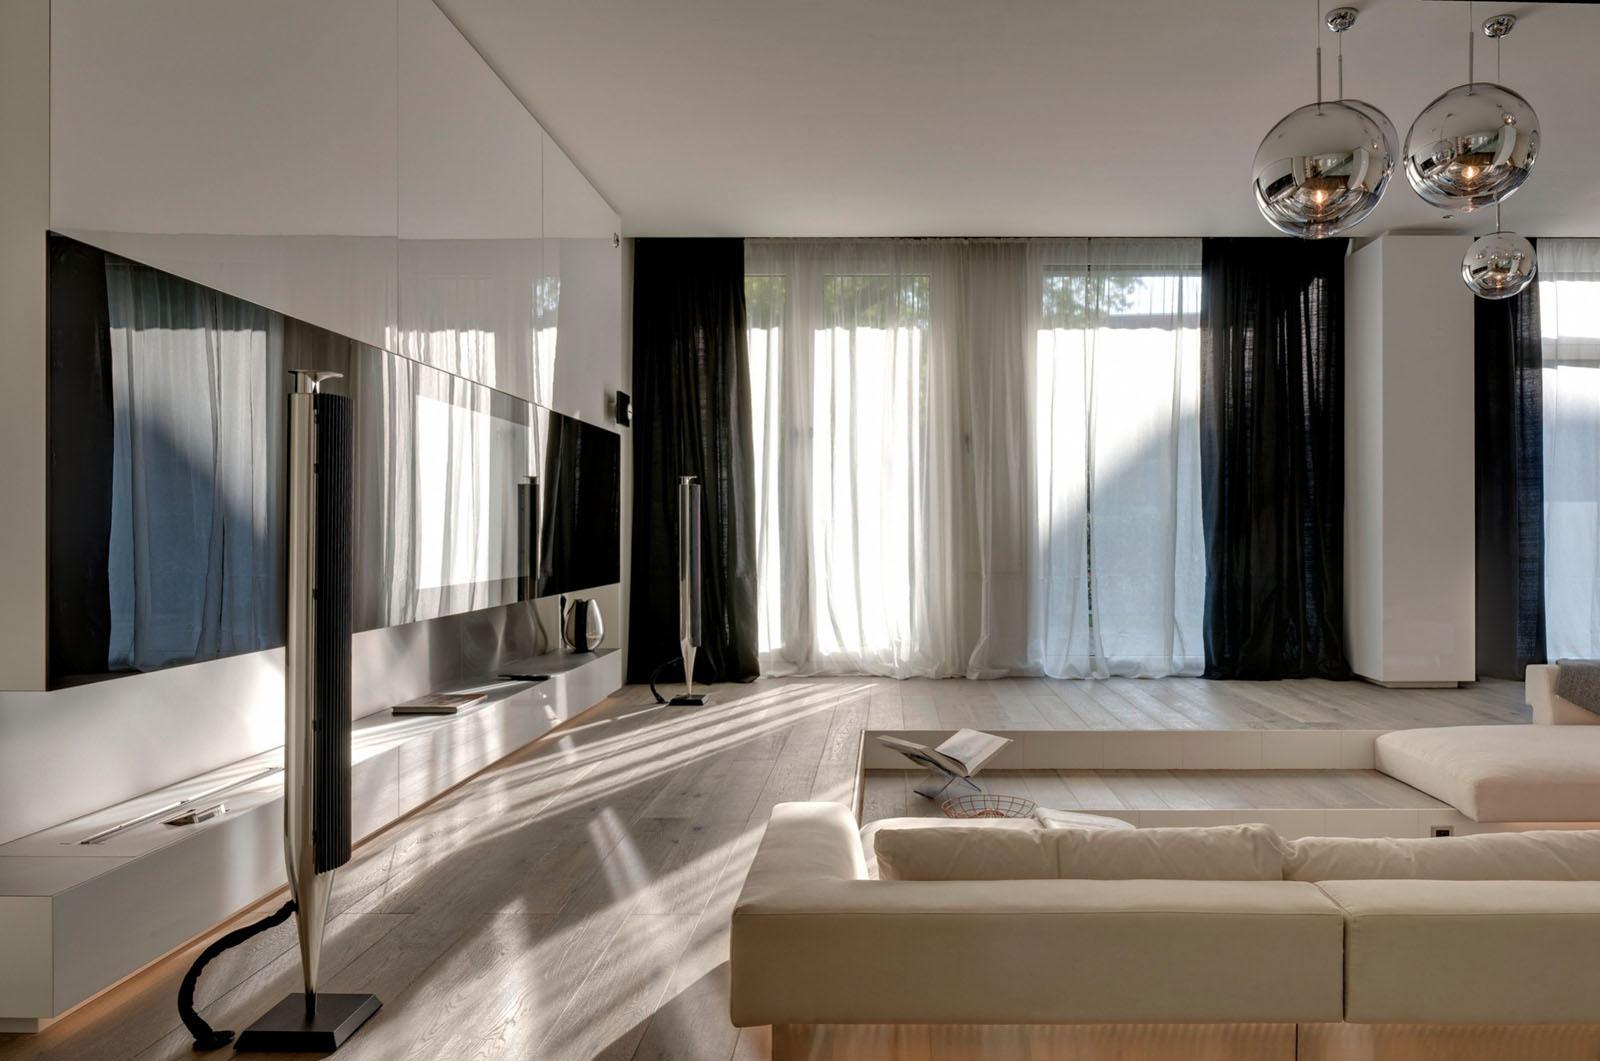 berlin mitte art loft 6 idesignarch interior design architecture interior decorating. Black Bedroom Furniture Sets. Home Design Ideas